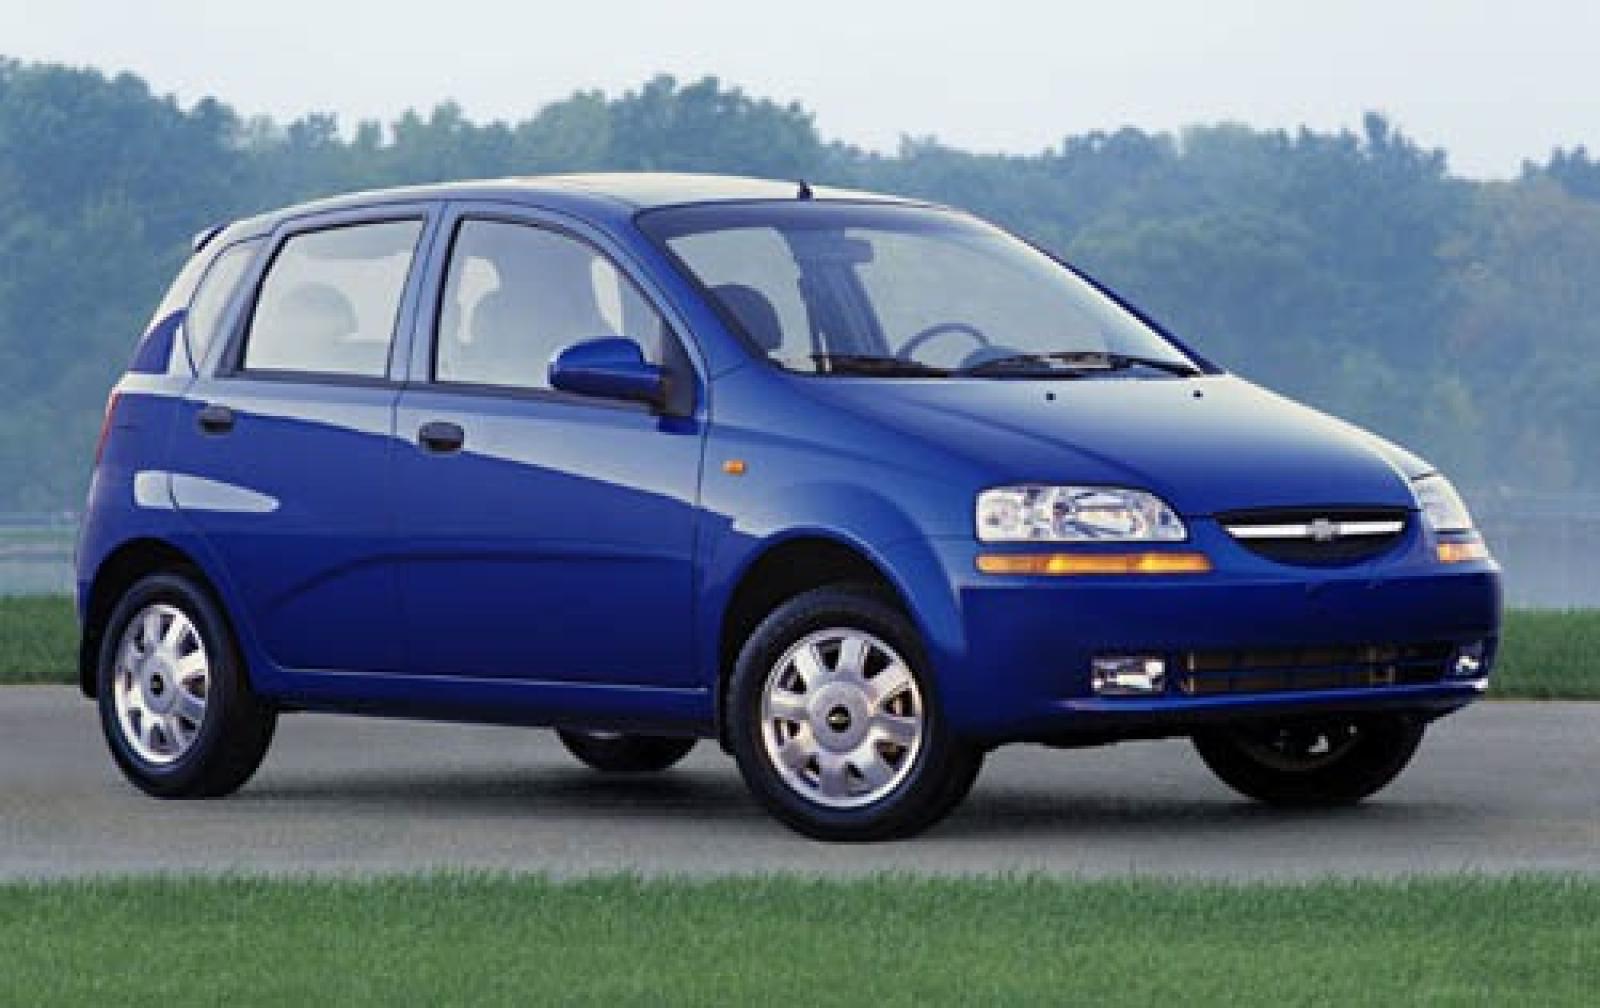 2004 Chevy Aveo Fuse Box Wiring Library 2007 Diagram 800 1024 1280 1600 Origin 2005 Chevrolet